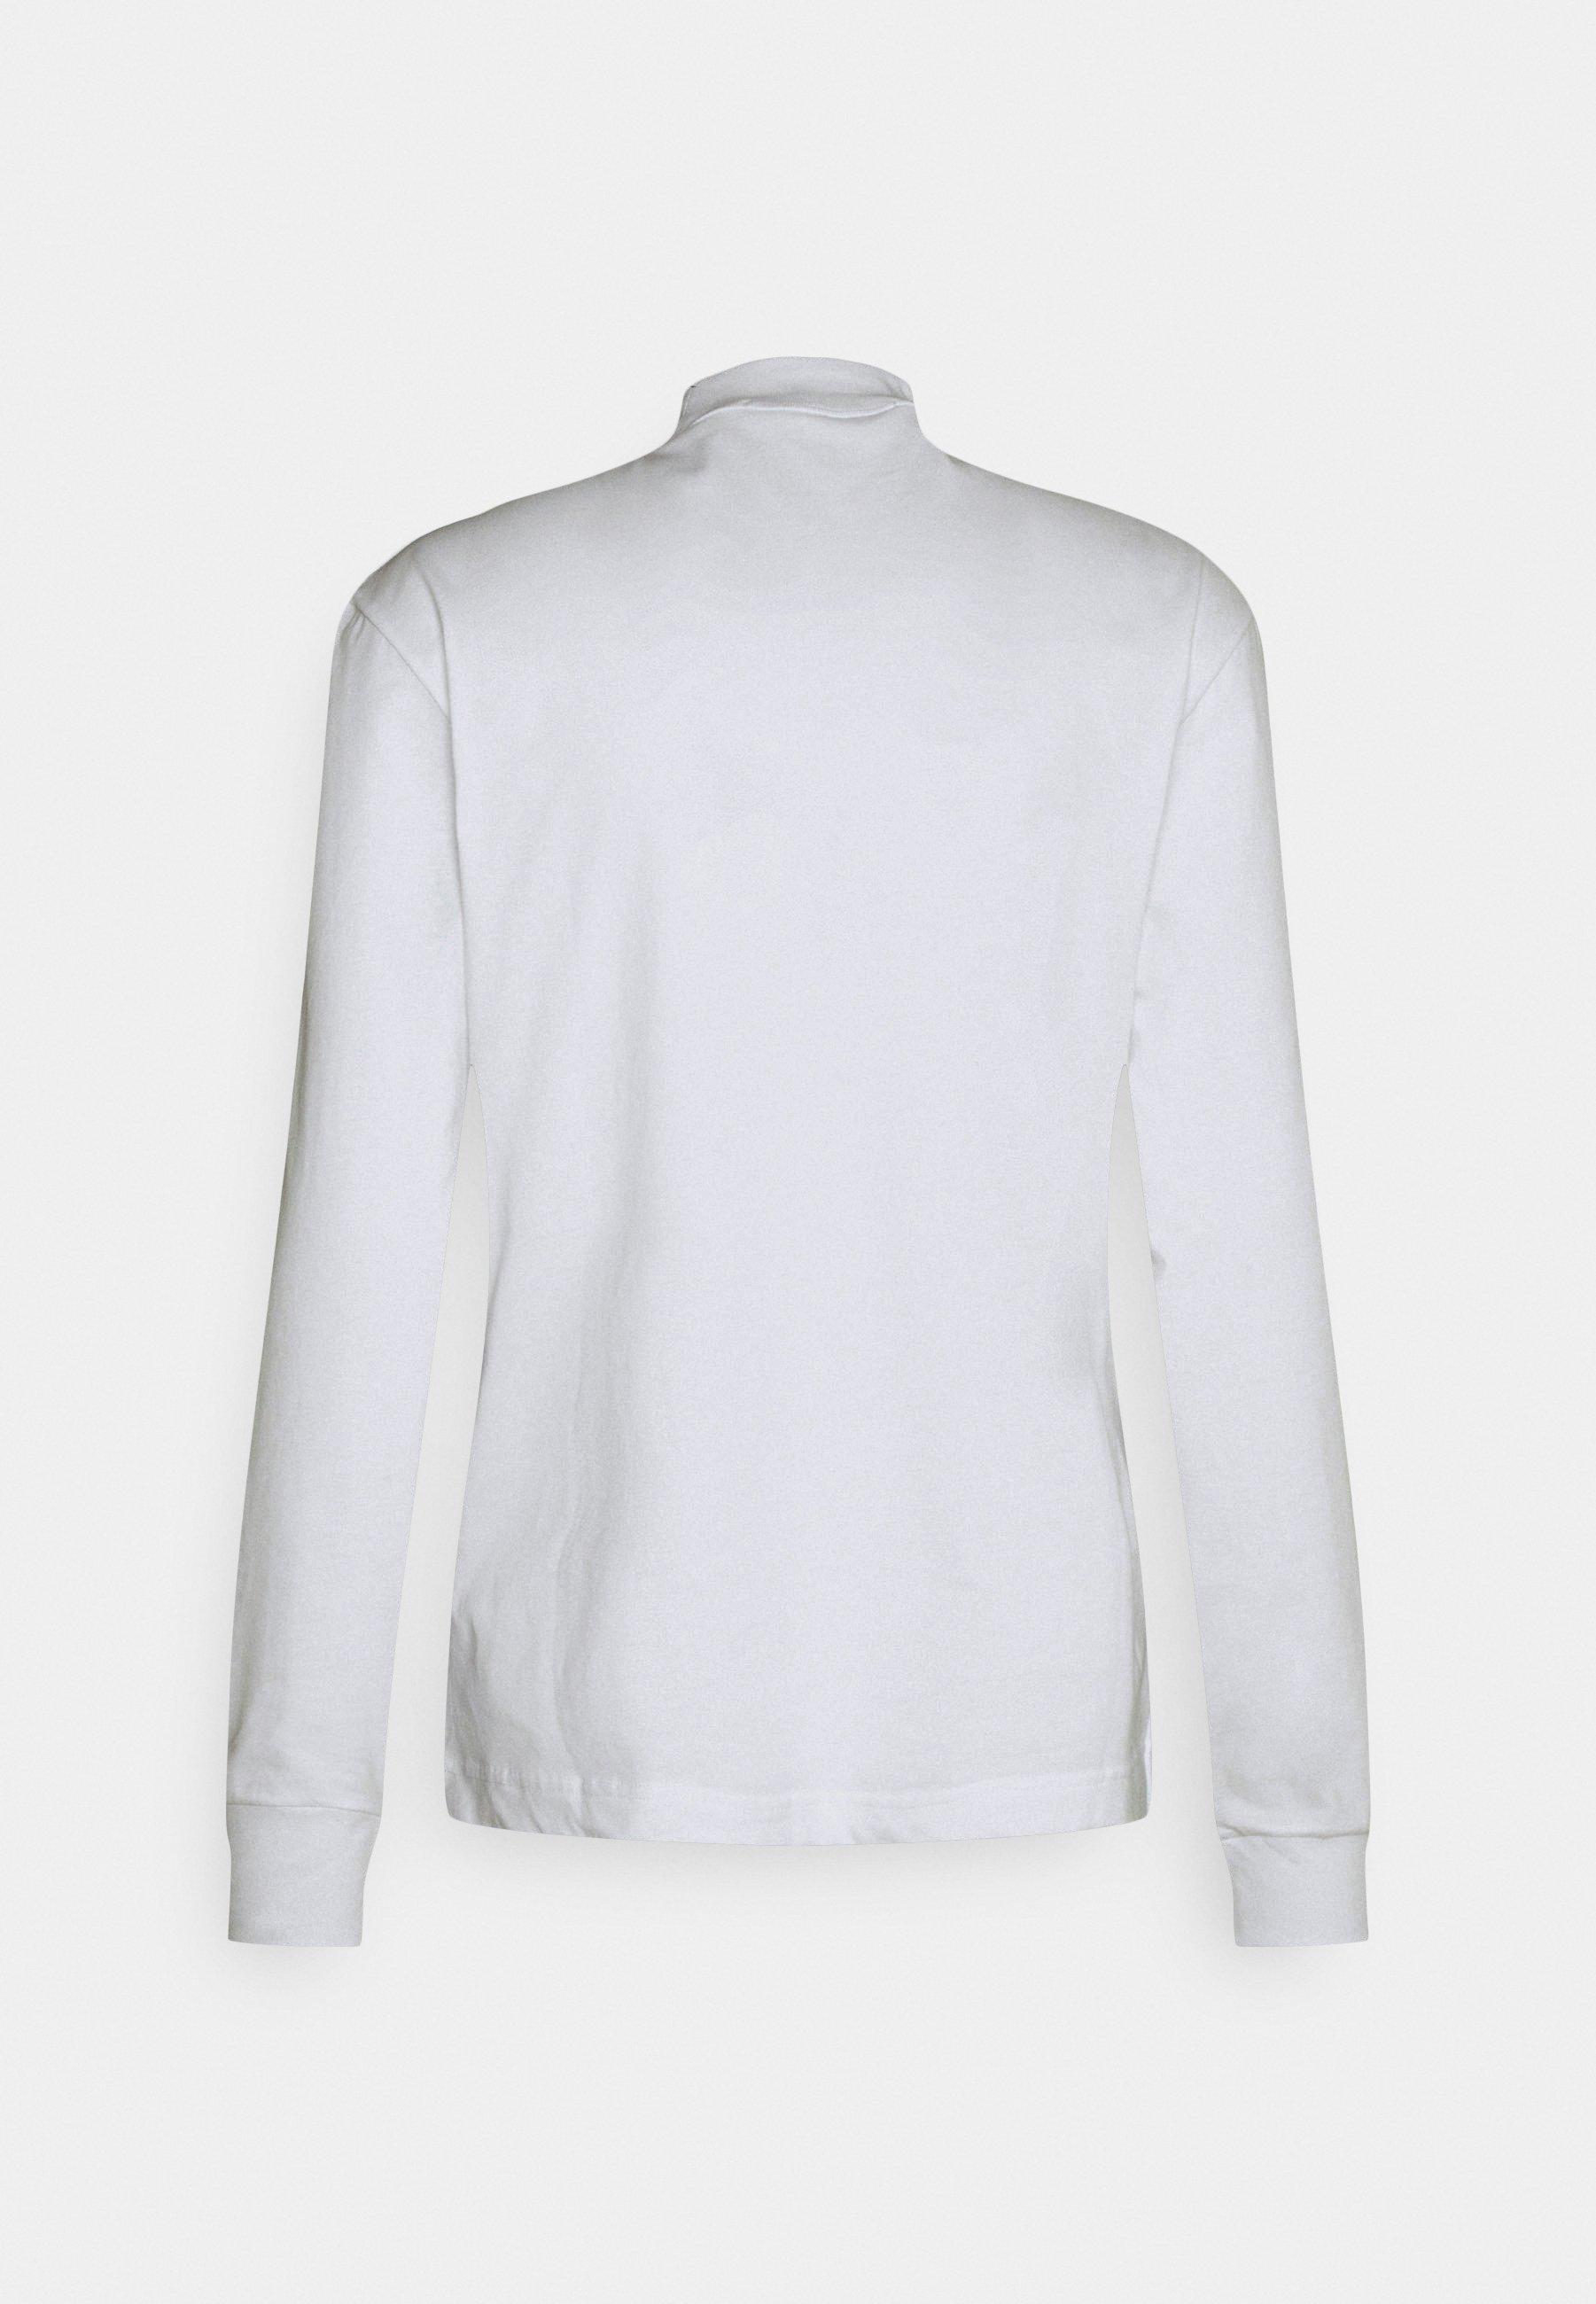 Men CENSORED MOCK NECK - Long sleeved top